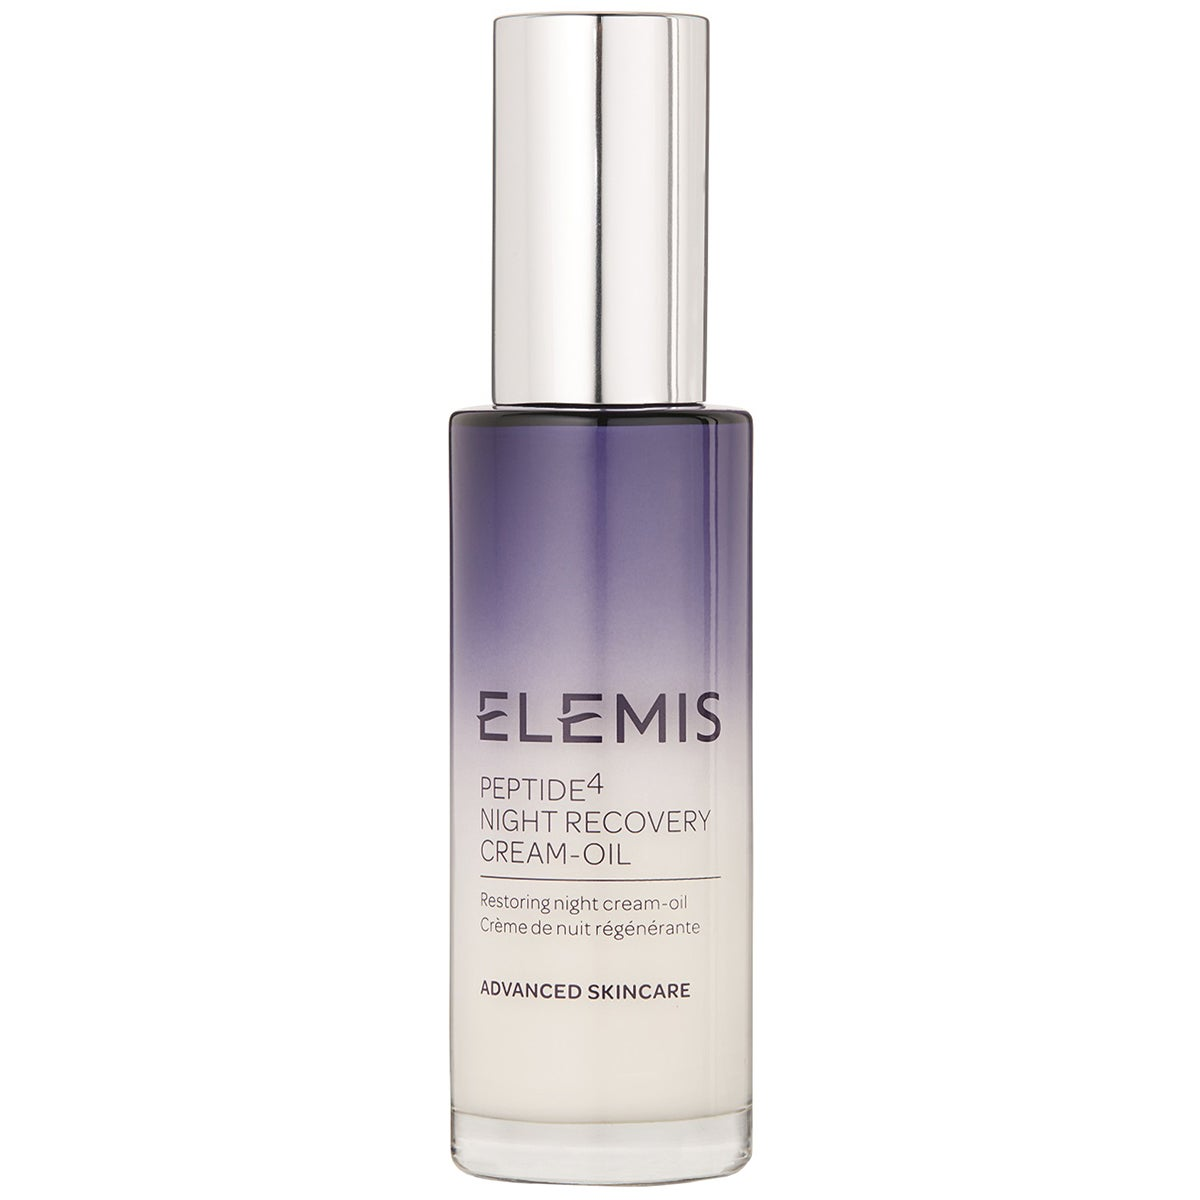 Peptide4 Night Recovery Cream-Oil, 30 ml Elemis Nattkräm